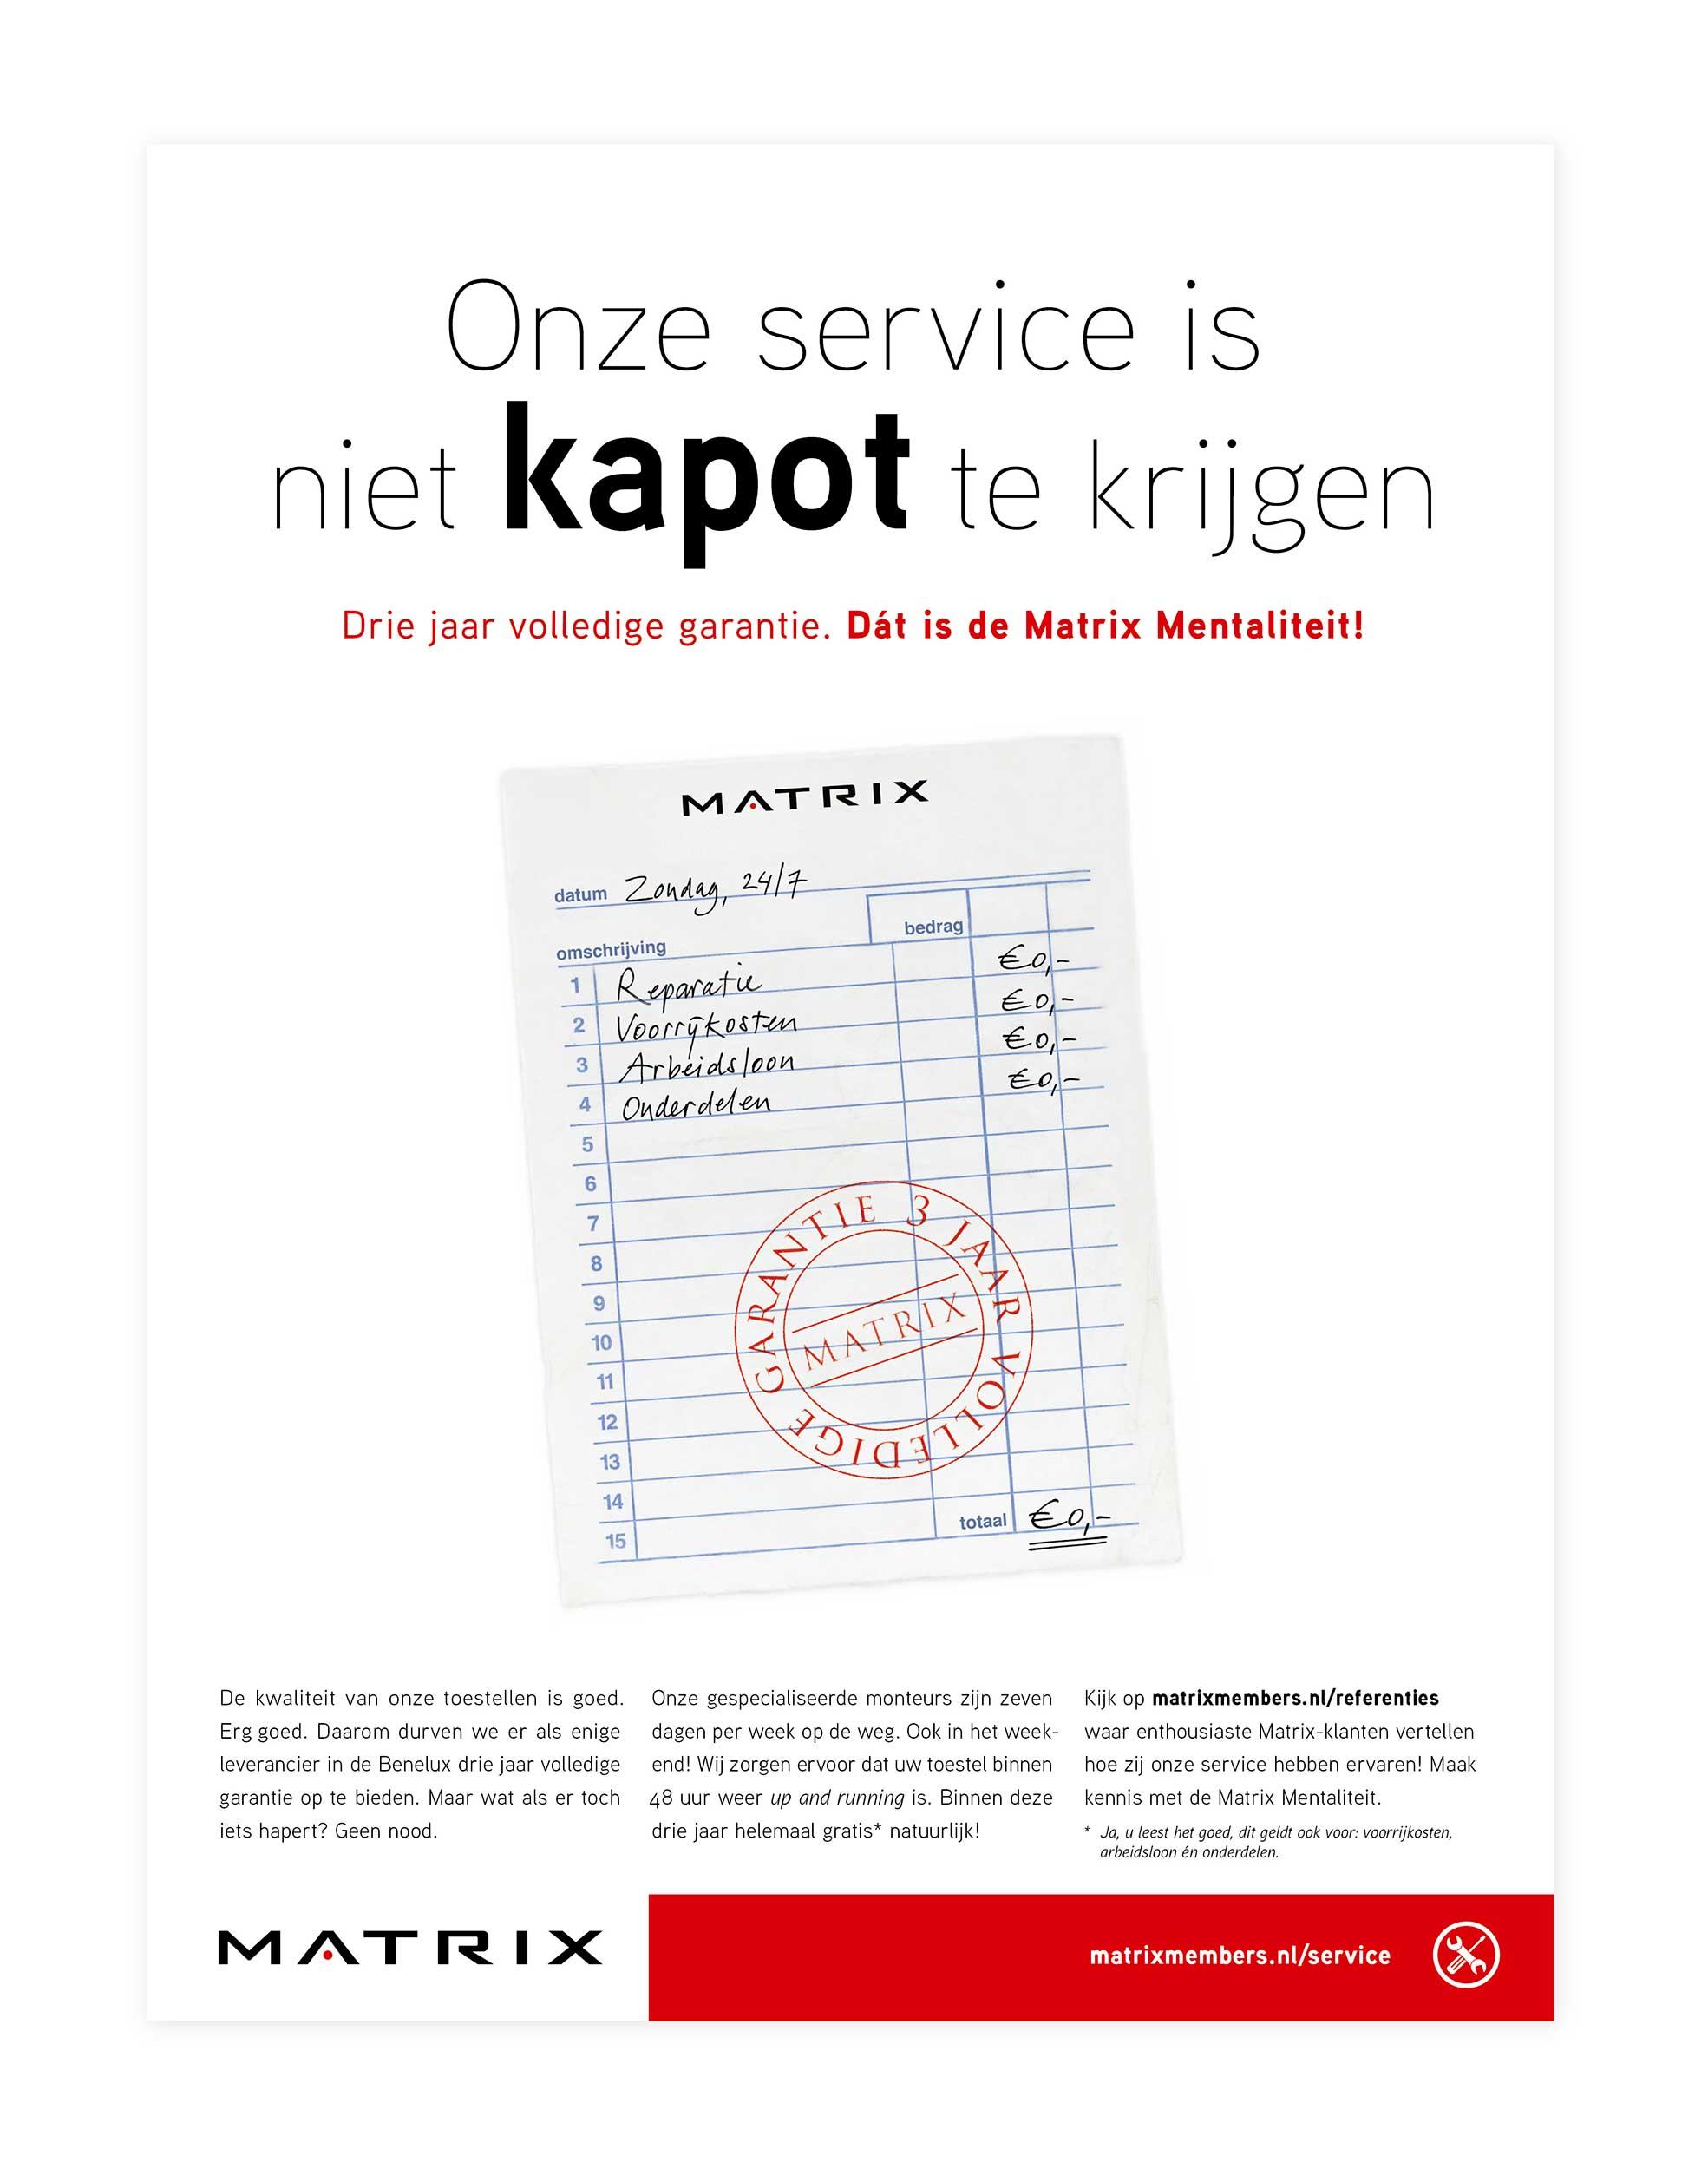 Service-advertentie Matrix, bonnetje: €0,-!!